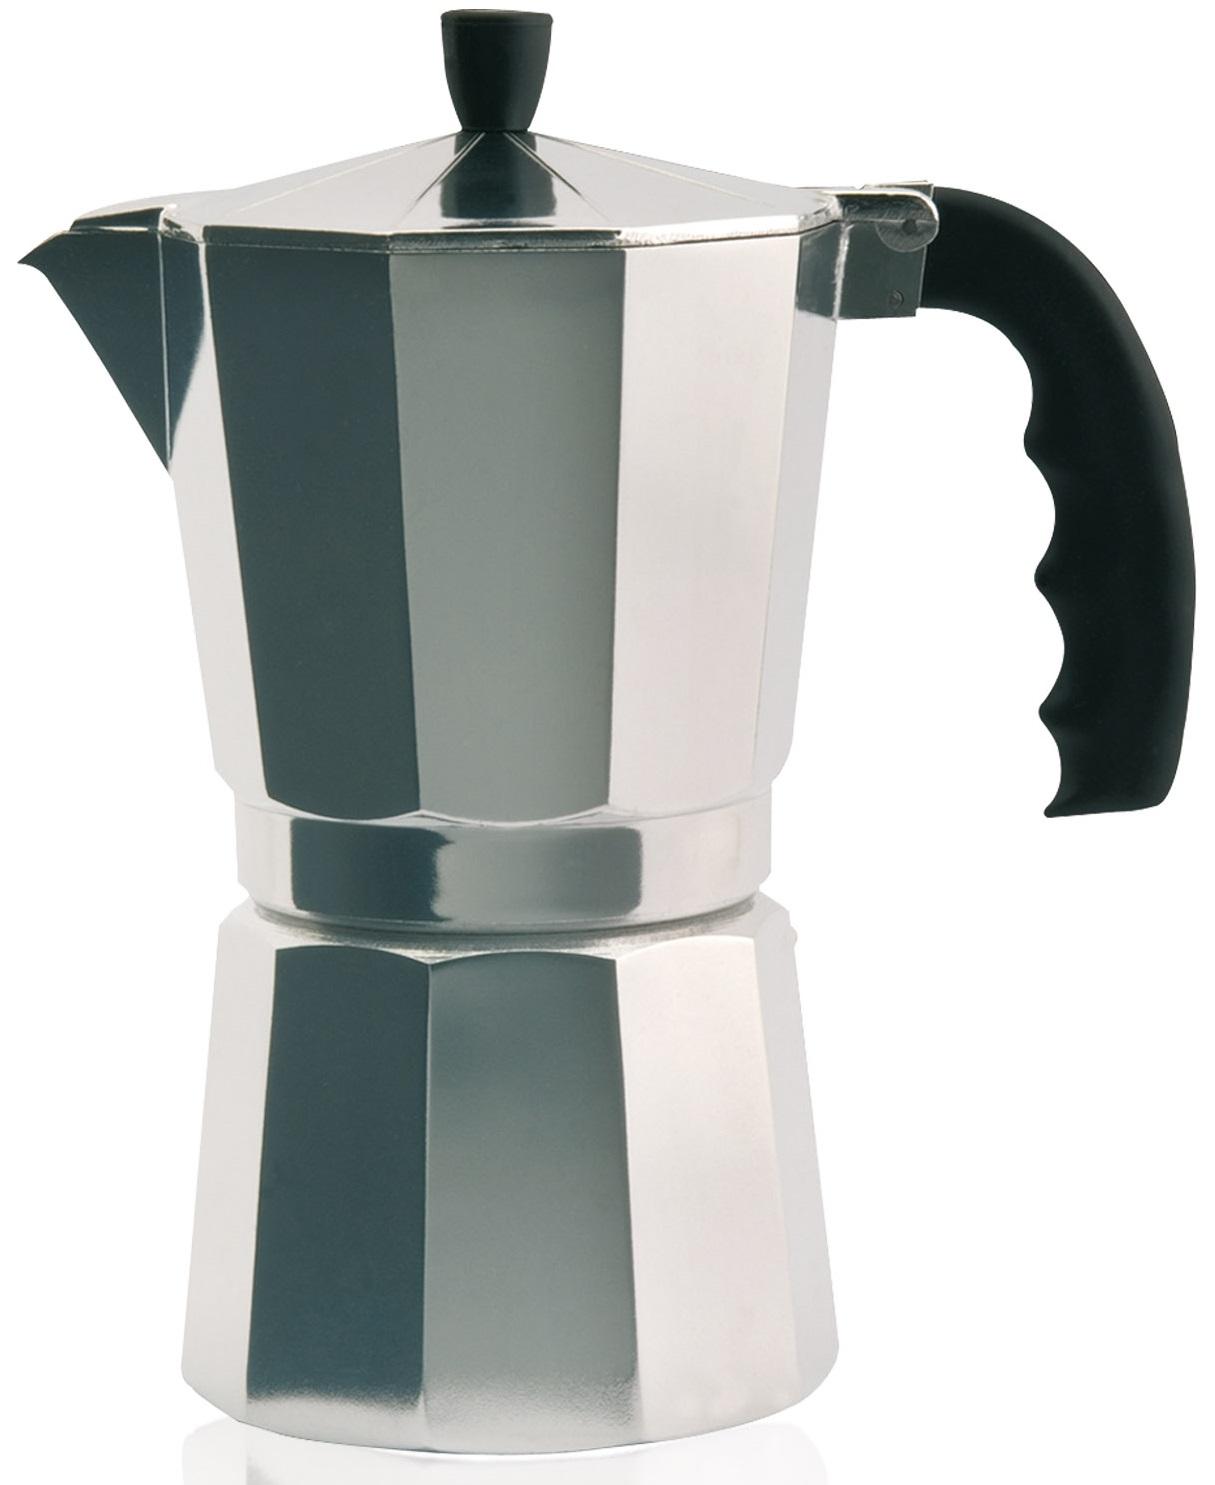 Cafeteira de Alumínio (1 Chávena) - ORBEGOZO